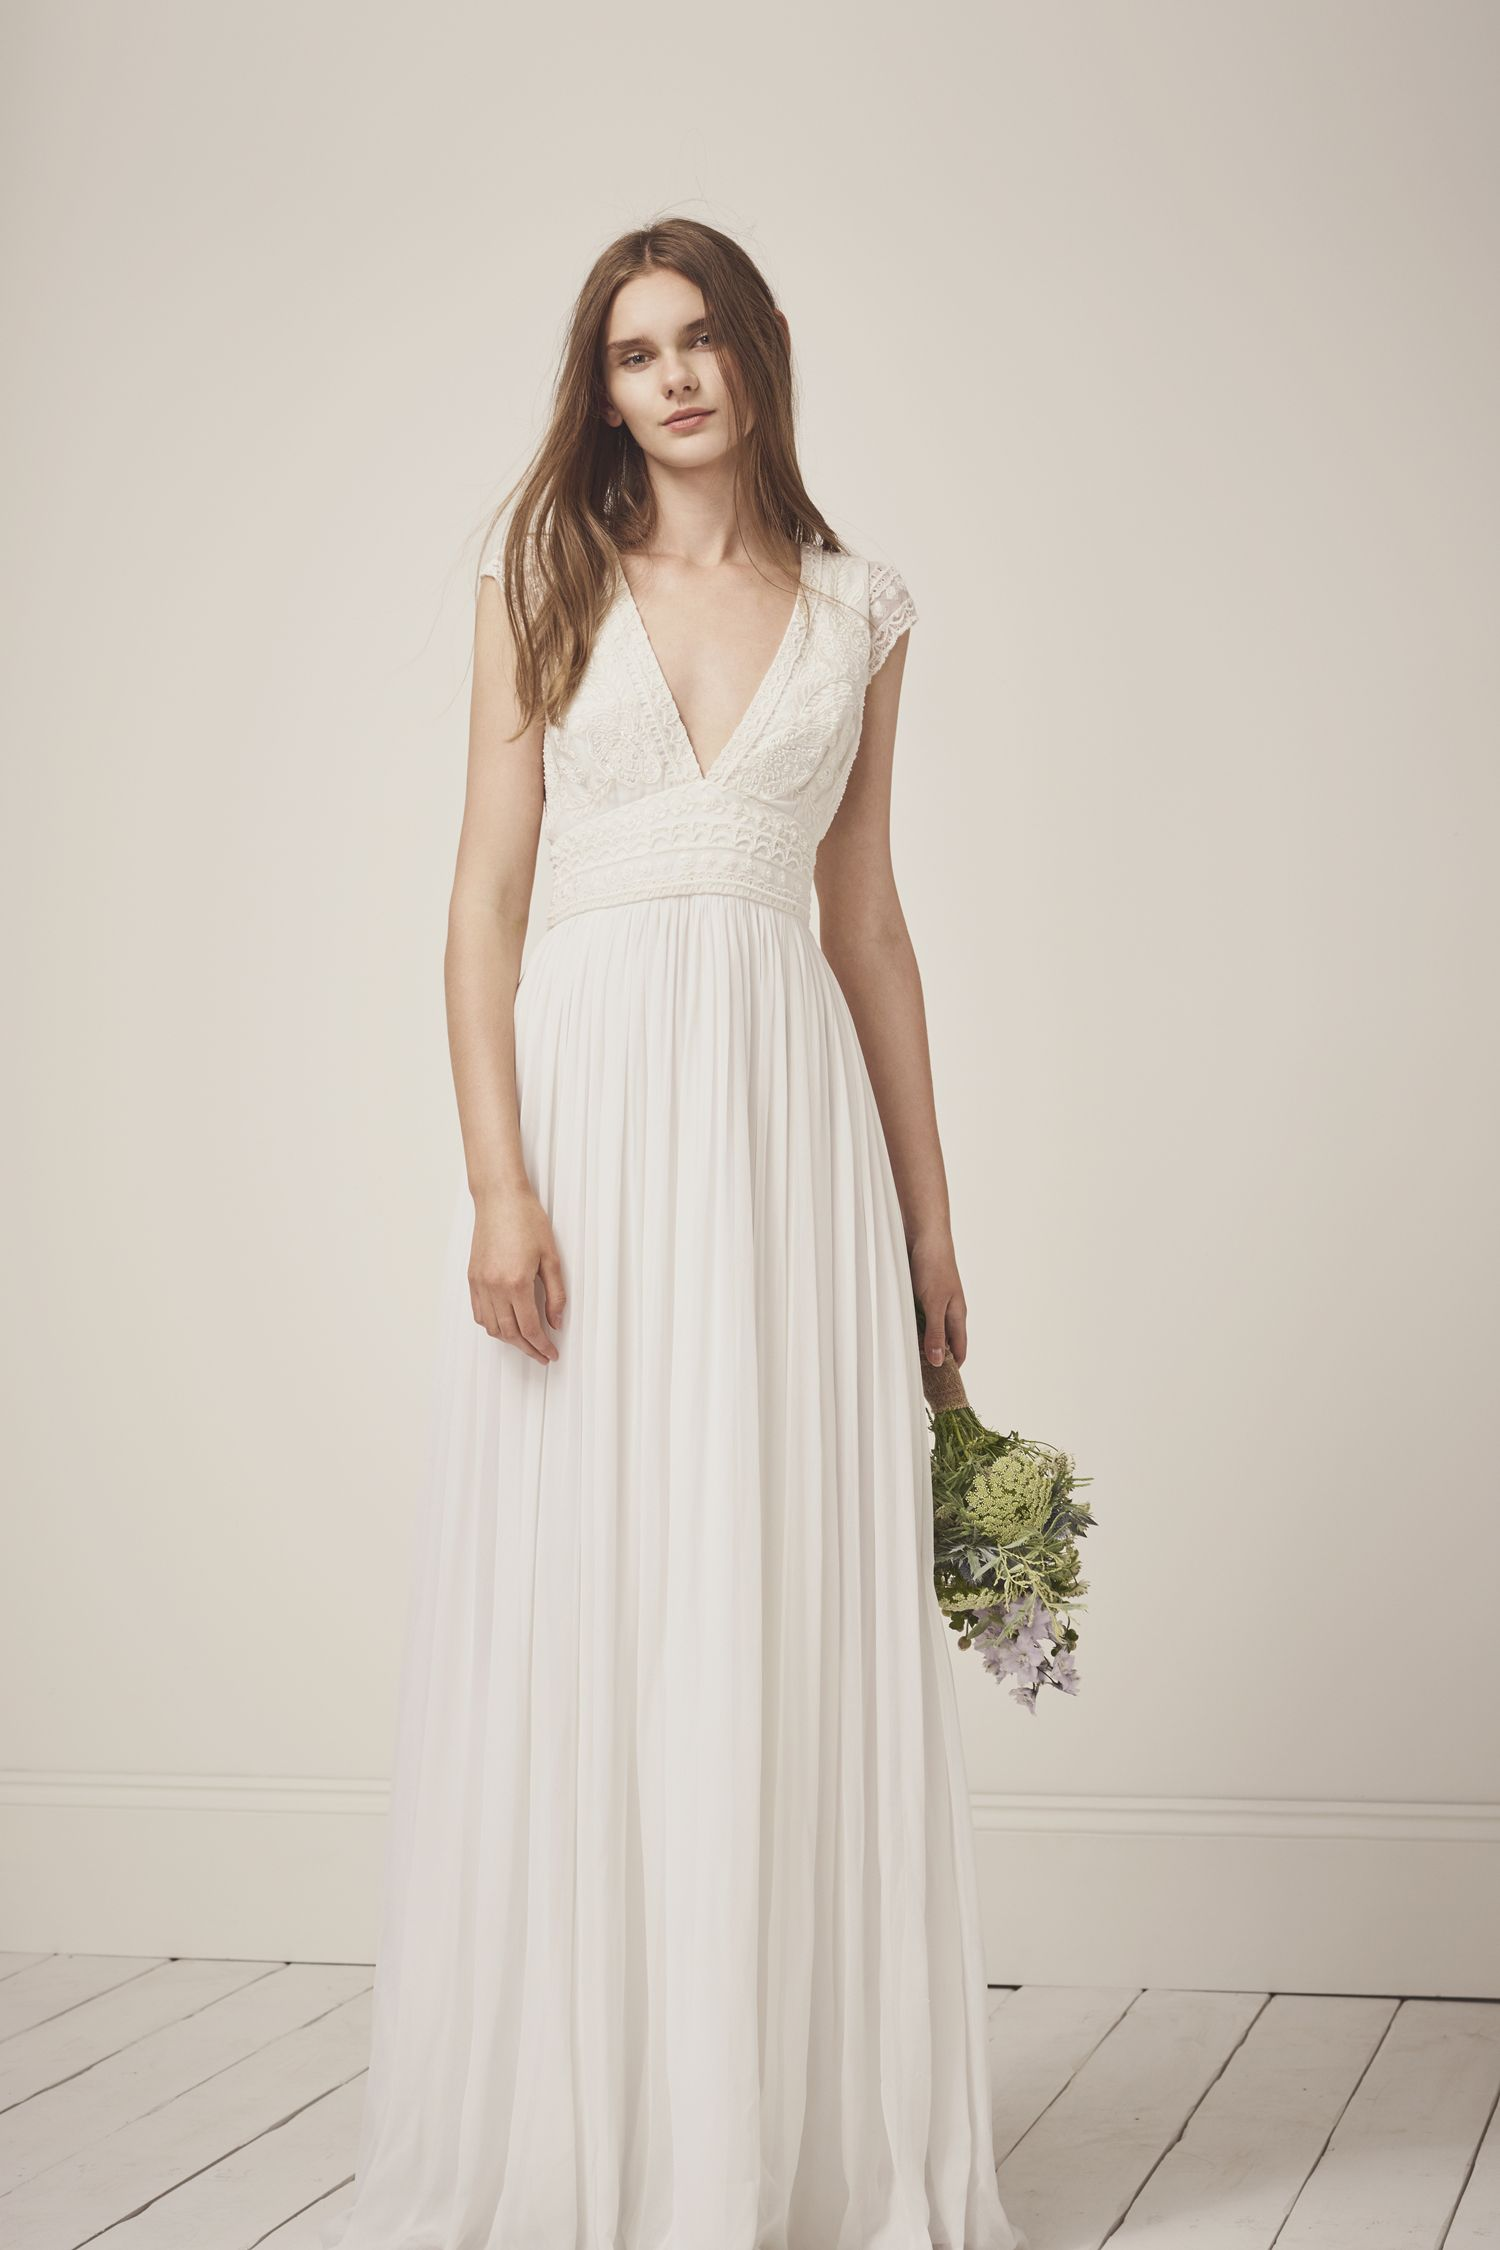 540c5dbc88208 Wedding Dress Usa Shop - raveitsafe